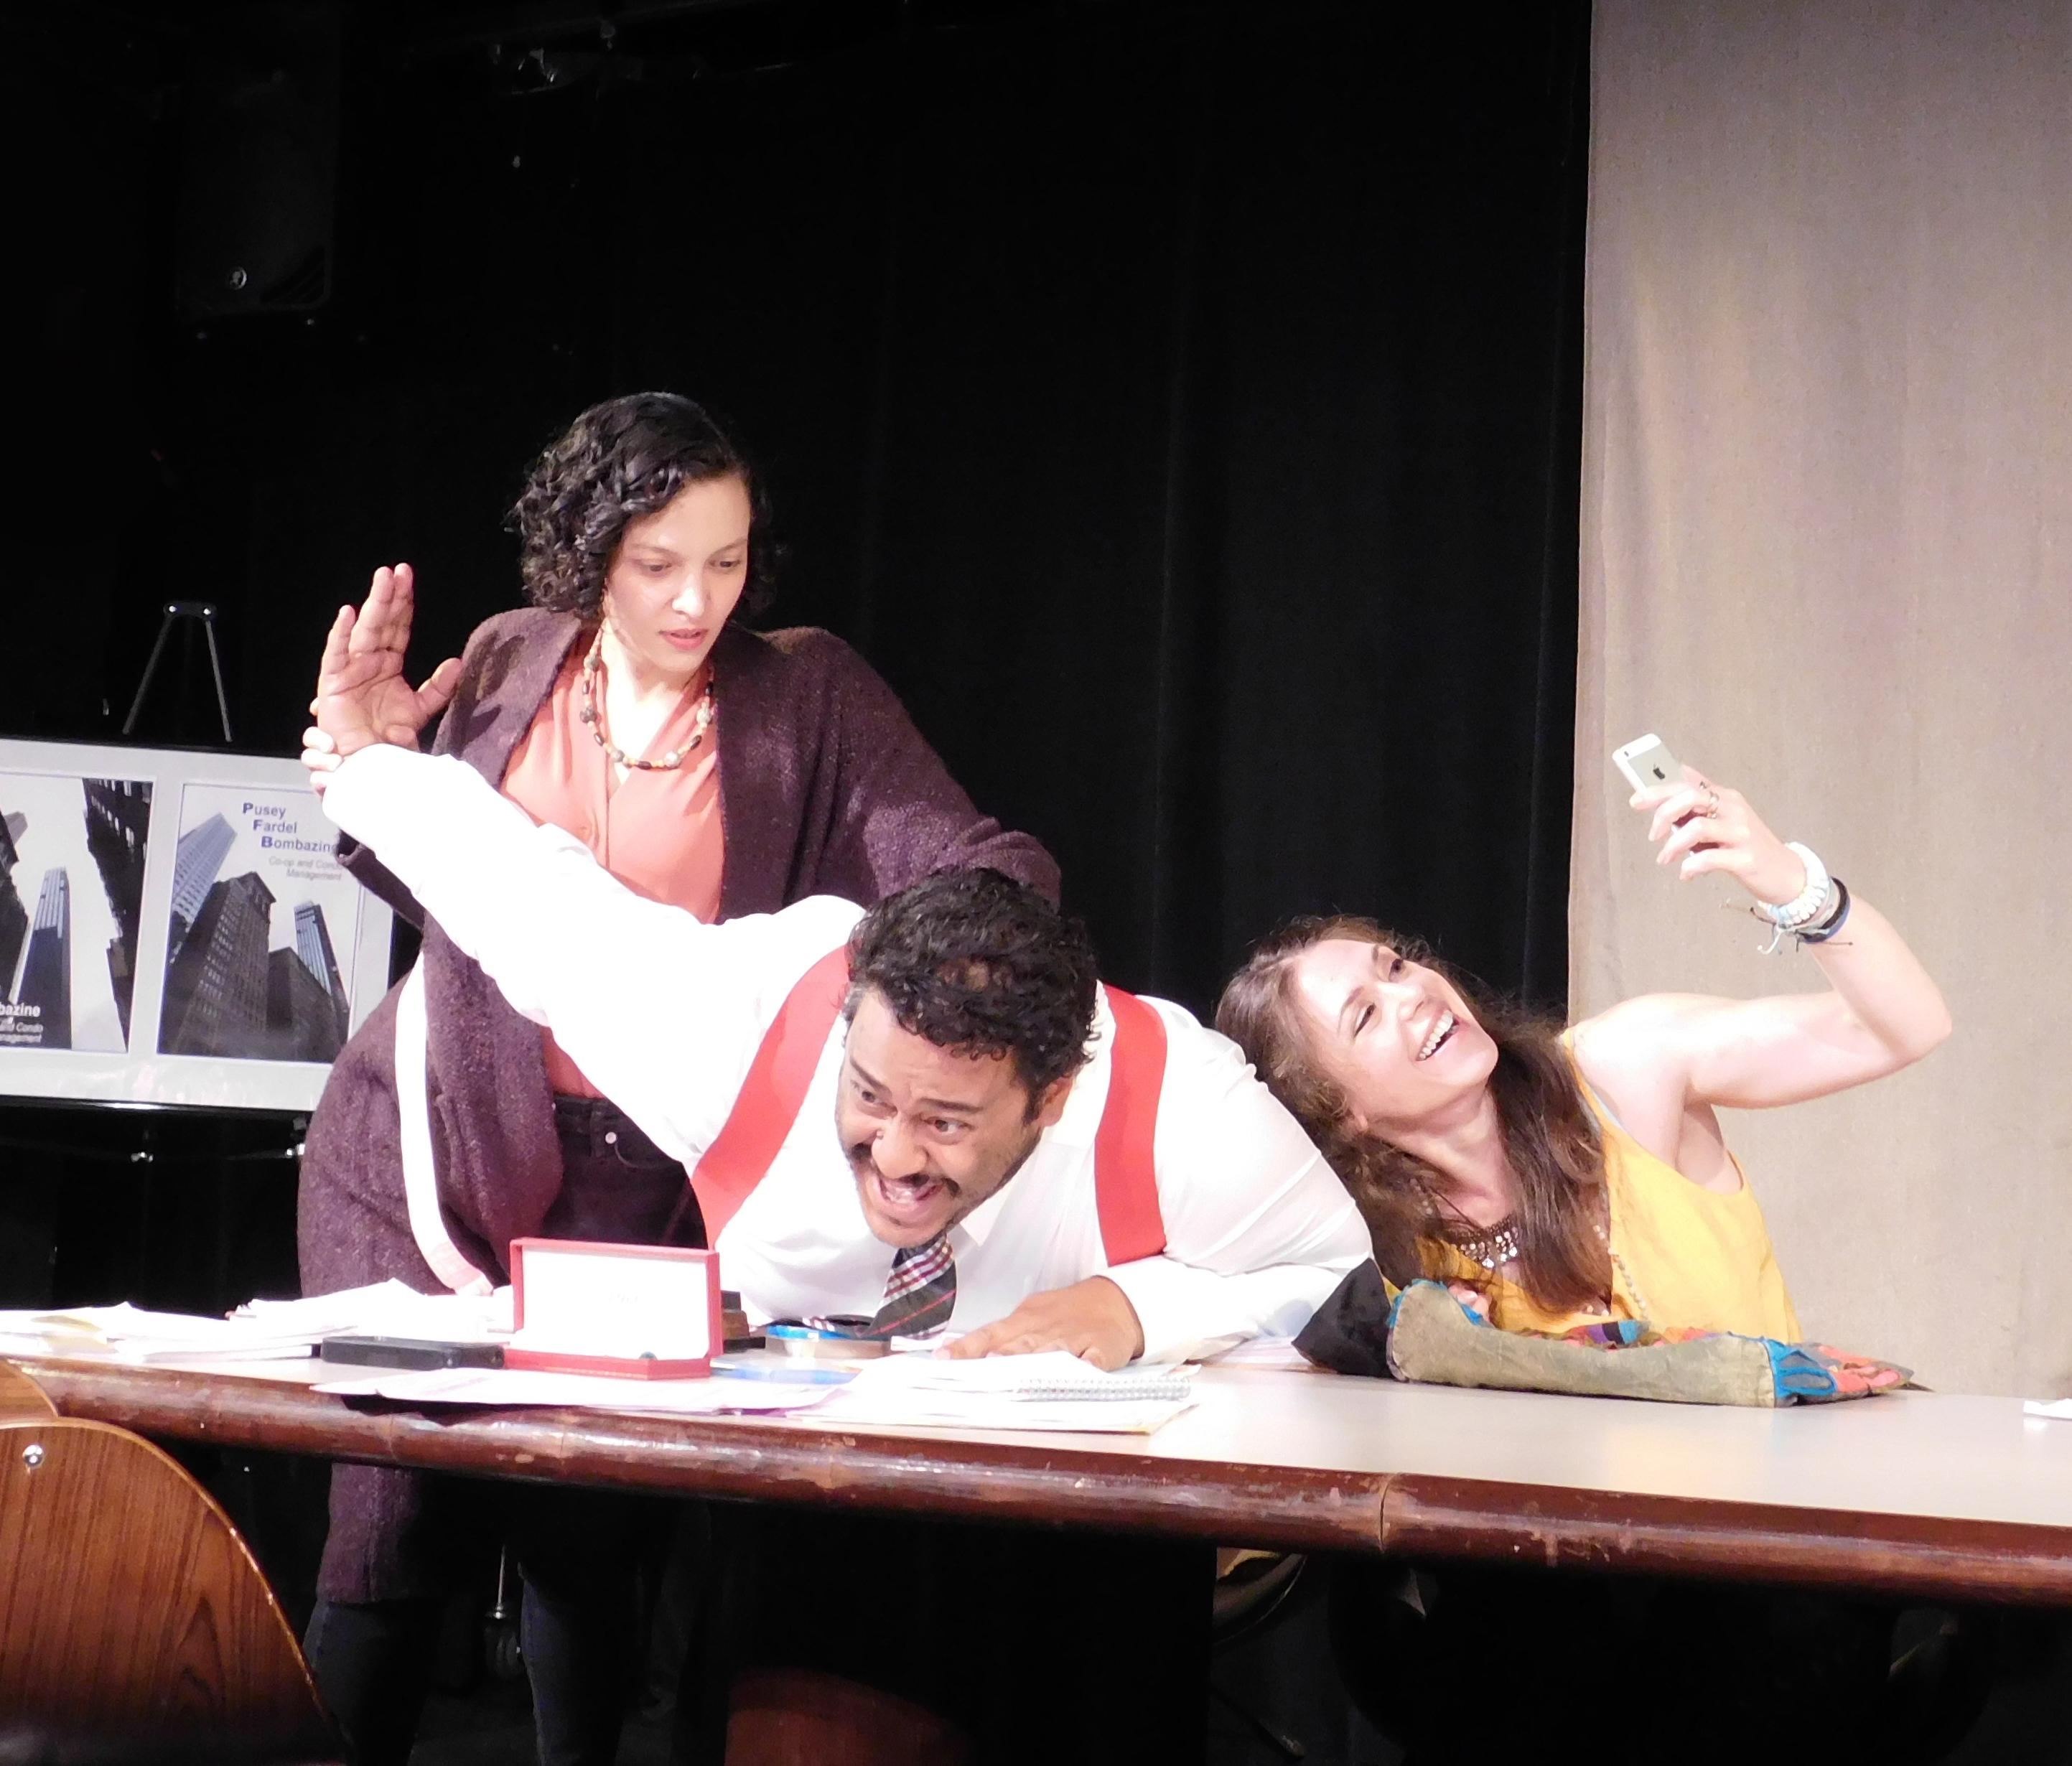 QUIET ENJOYMENT by Richard Curtis - L to R Samantha Mercado Tudda (MERRY), Mario Claudio (BIMSKY) _ Megan Simard (KARMA), Photo by Mozinya Productions